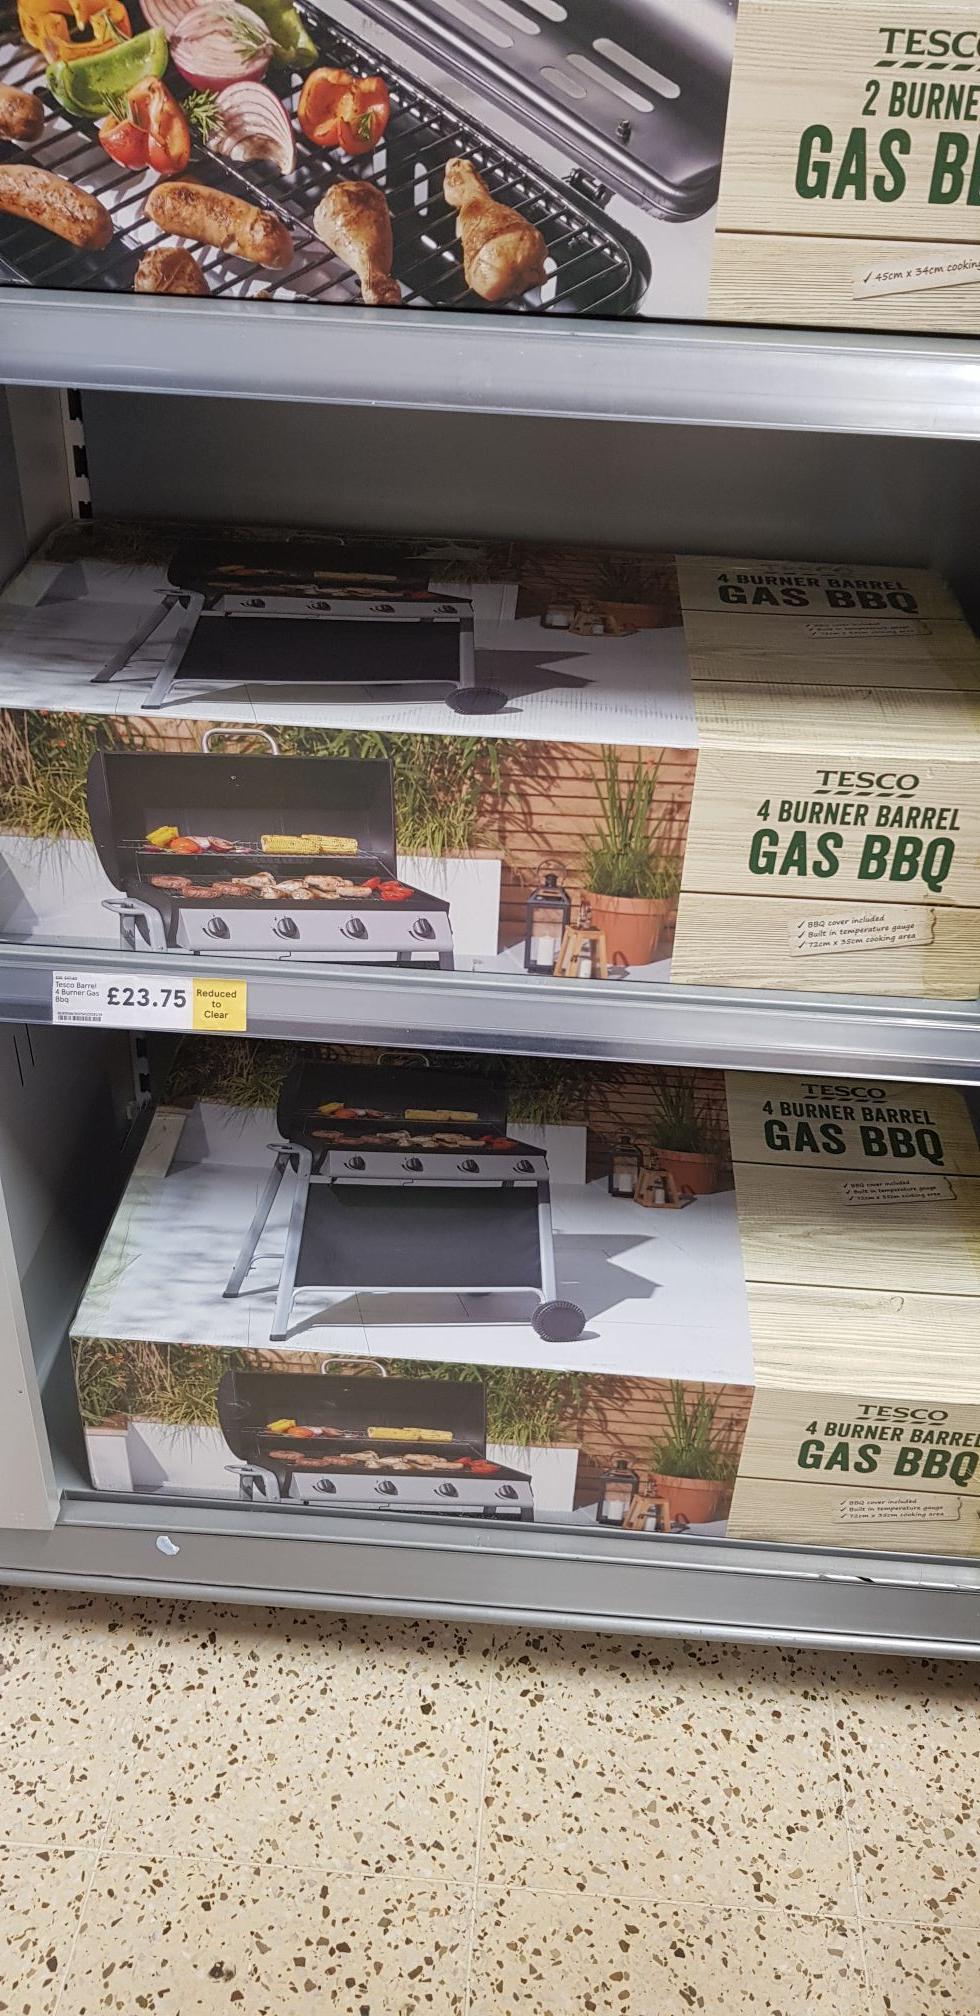 4 burner barrel Gas bbq £23.75 instore Tesco Narborough Road Leicester